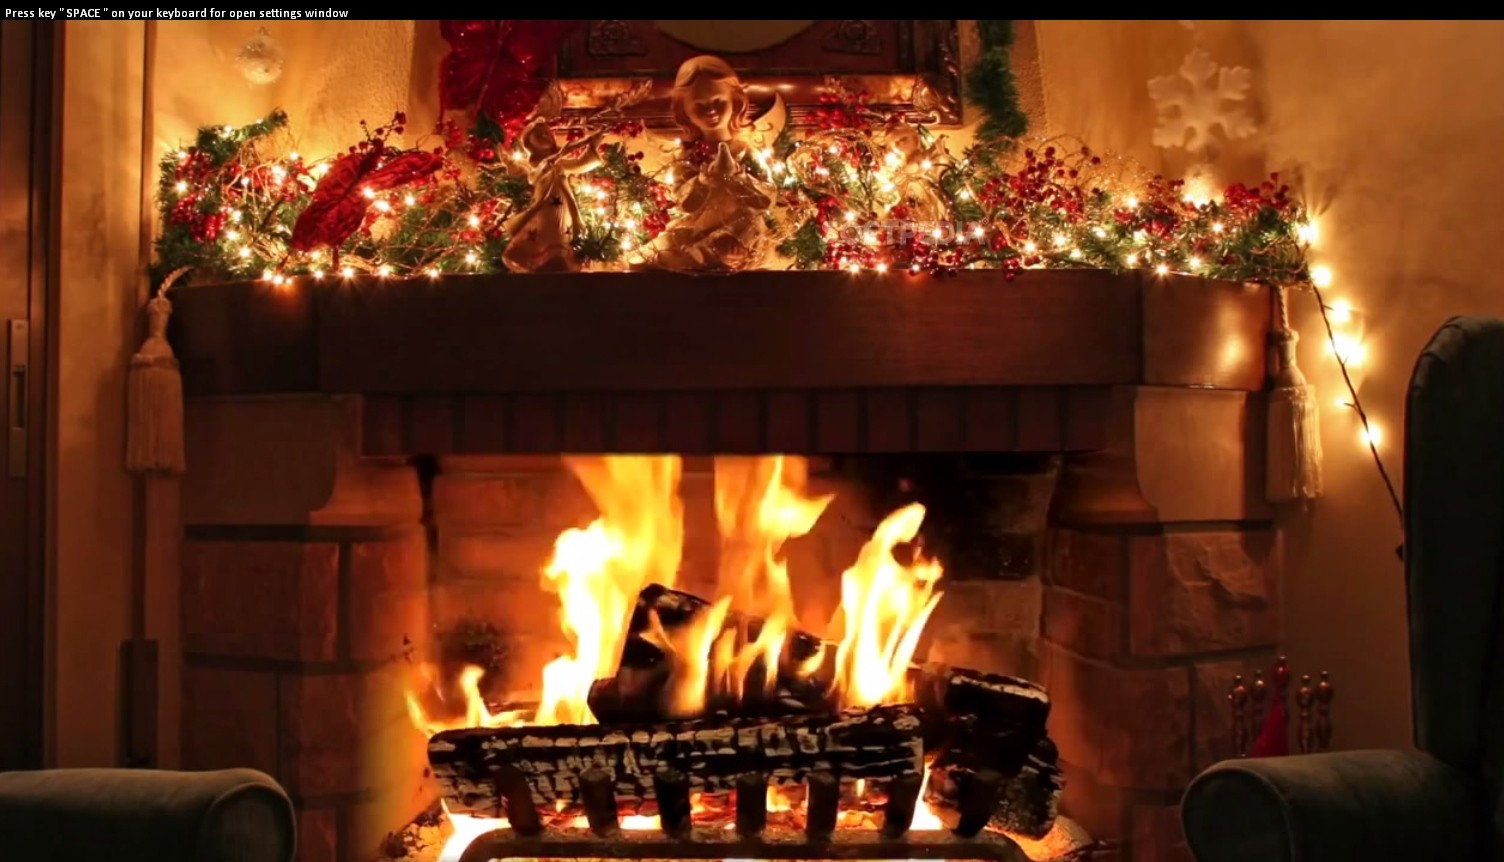 Free Christmas Fireplace Screensaver  Christmas Fireplace ScreenSaver Download